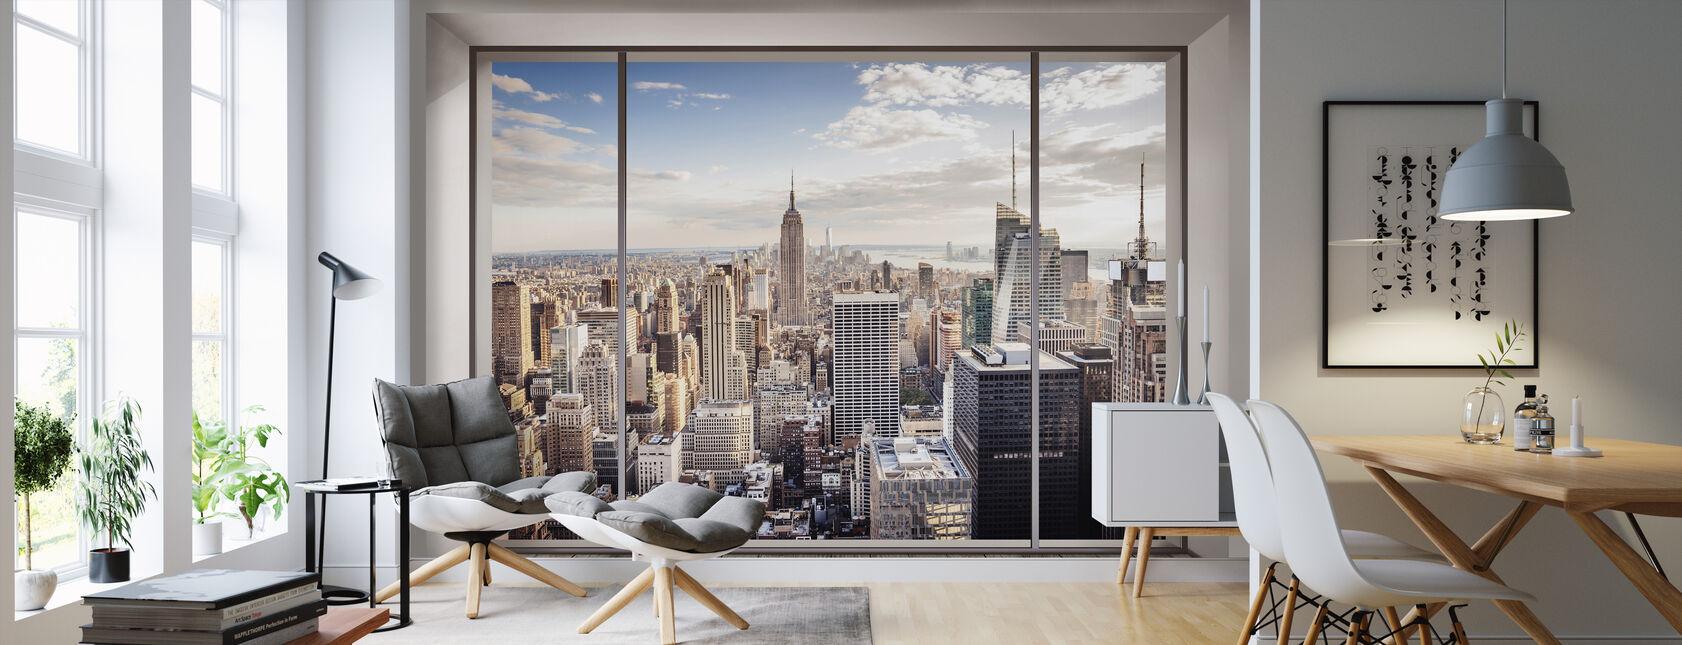 Manhattan Skyline - Wallpaper - Living Room